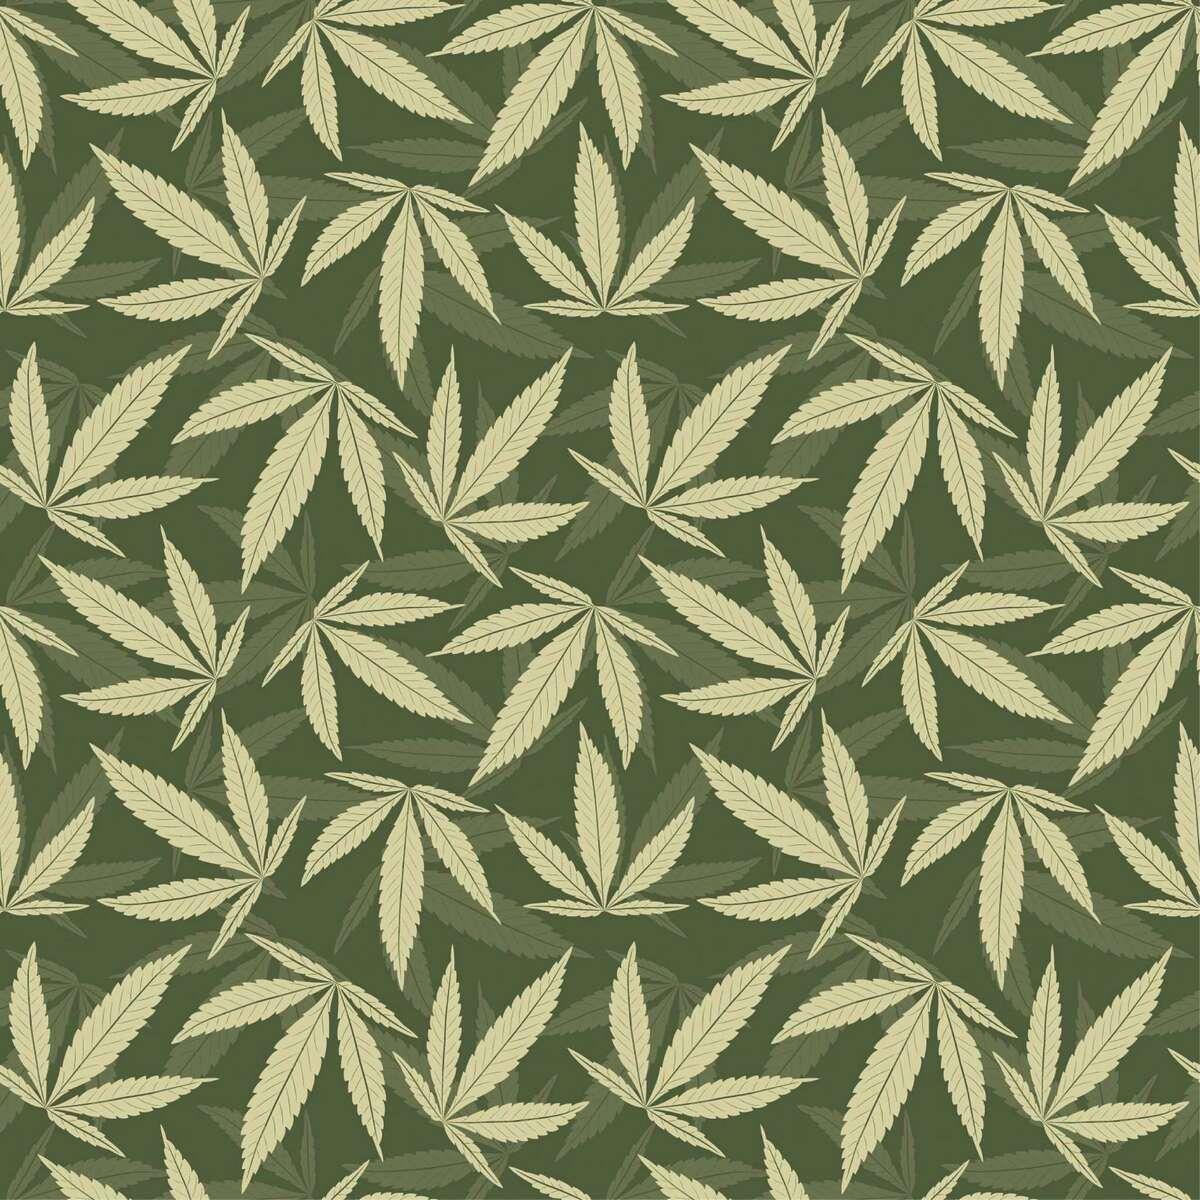 marijuana leaves marijuana leaves in one pattern